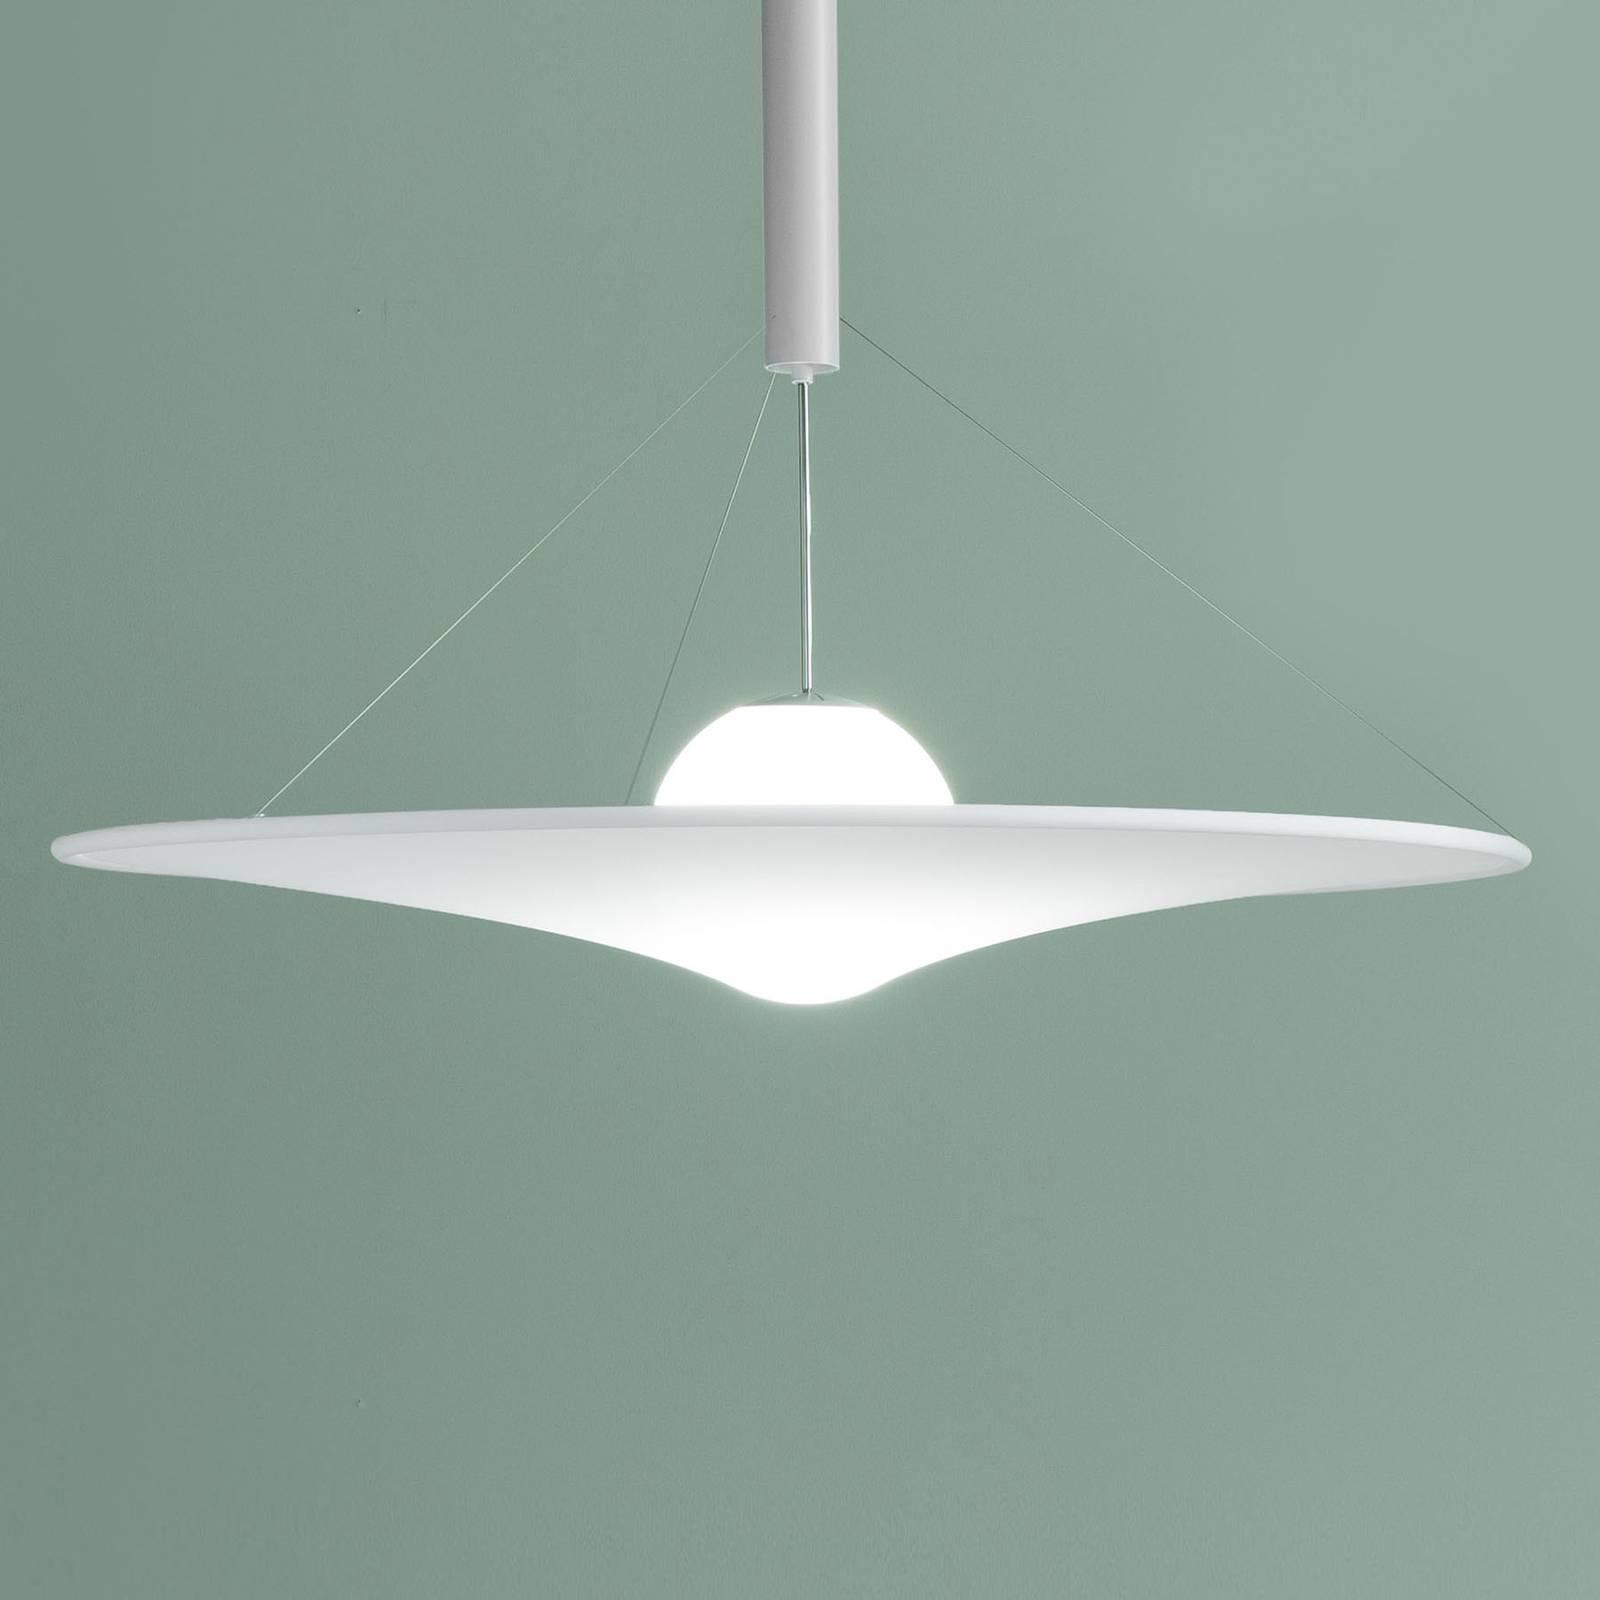 Axolight Manto LED design-hanglamp, Ø 120cm